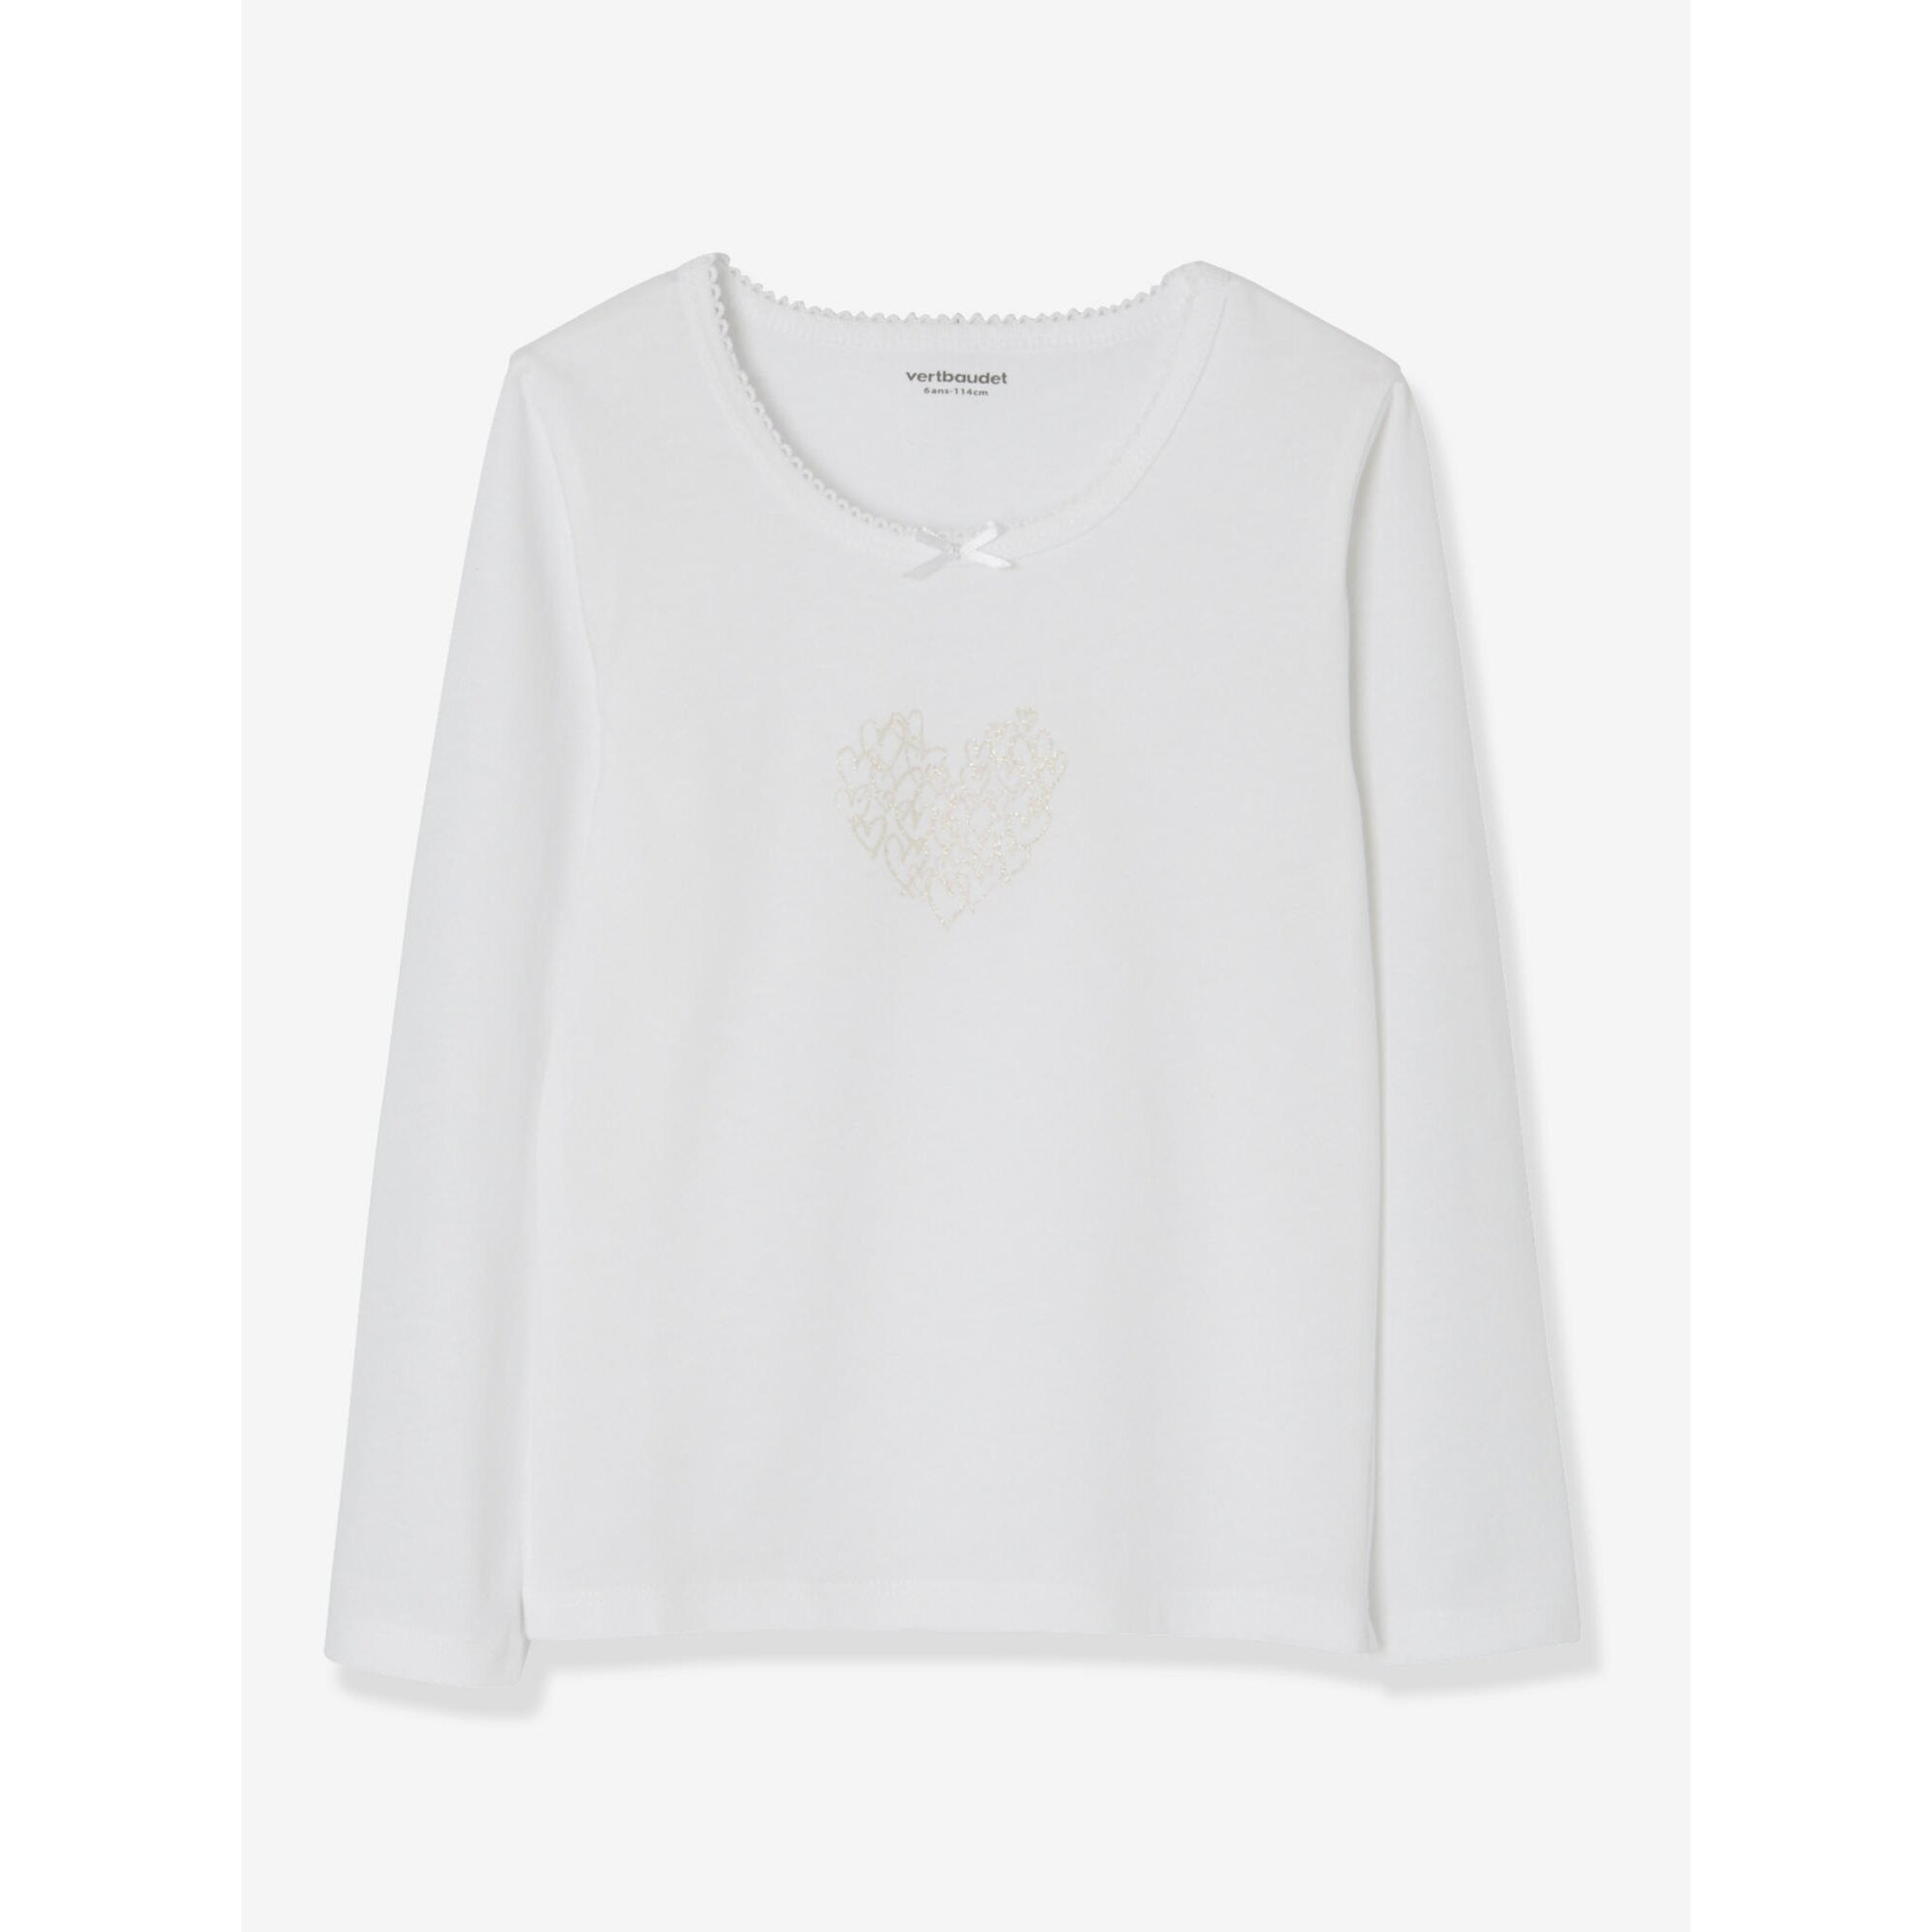 vertbaudet-happy-price-4er-pack-madchenshirts